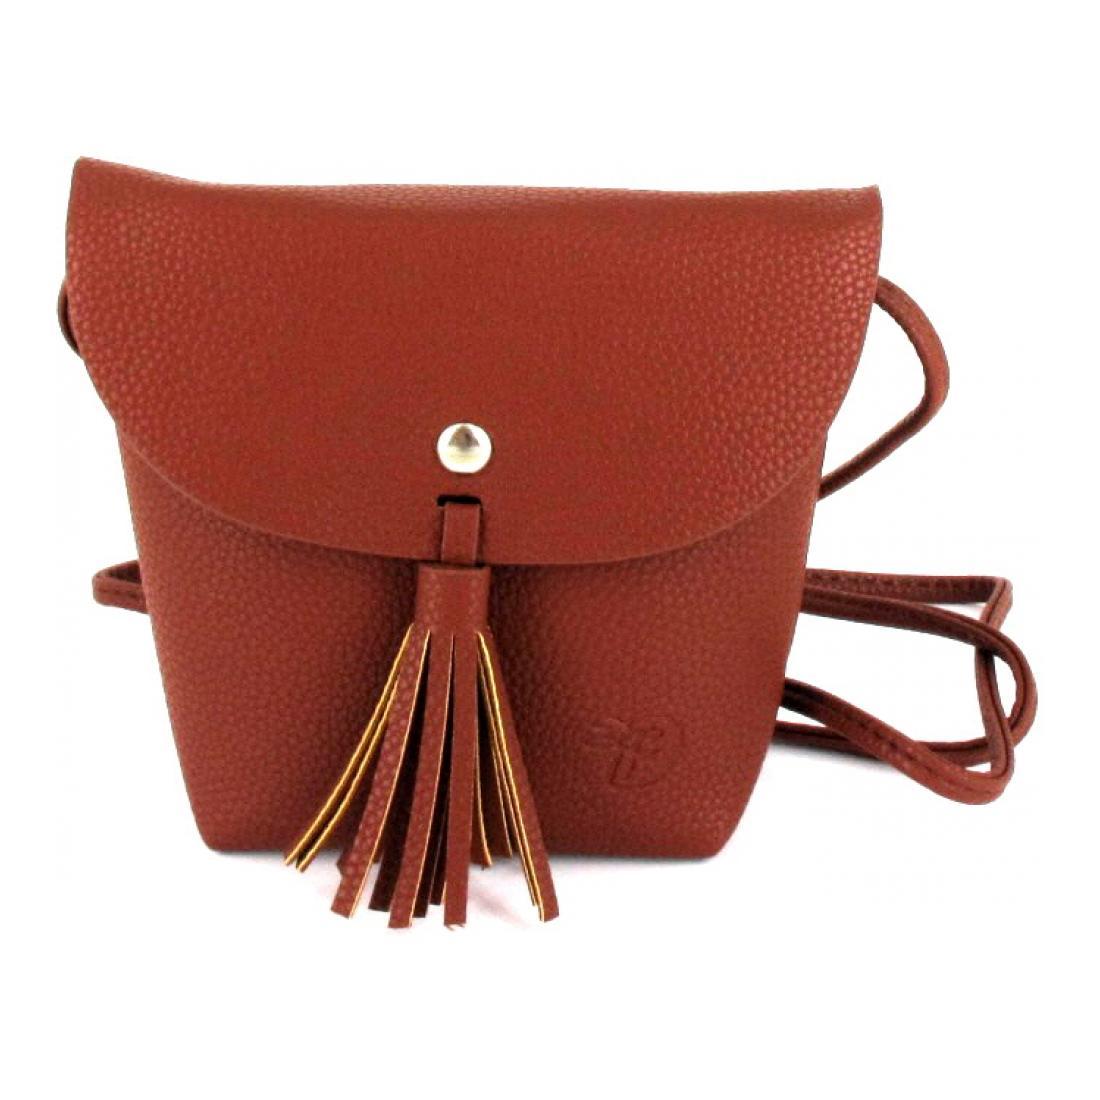 Tom Tailor Tasche Ida Flap bag